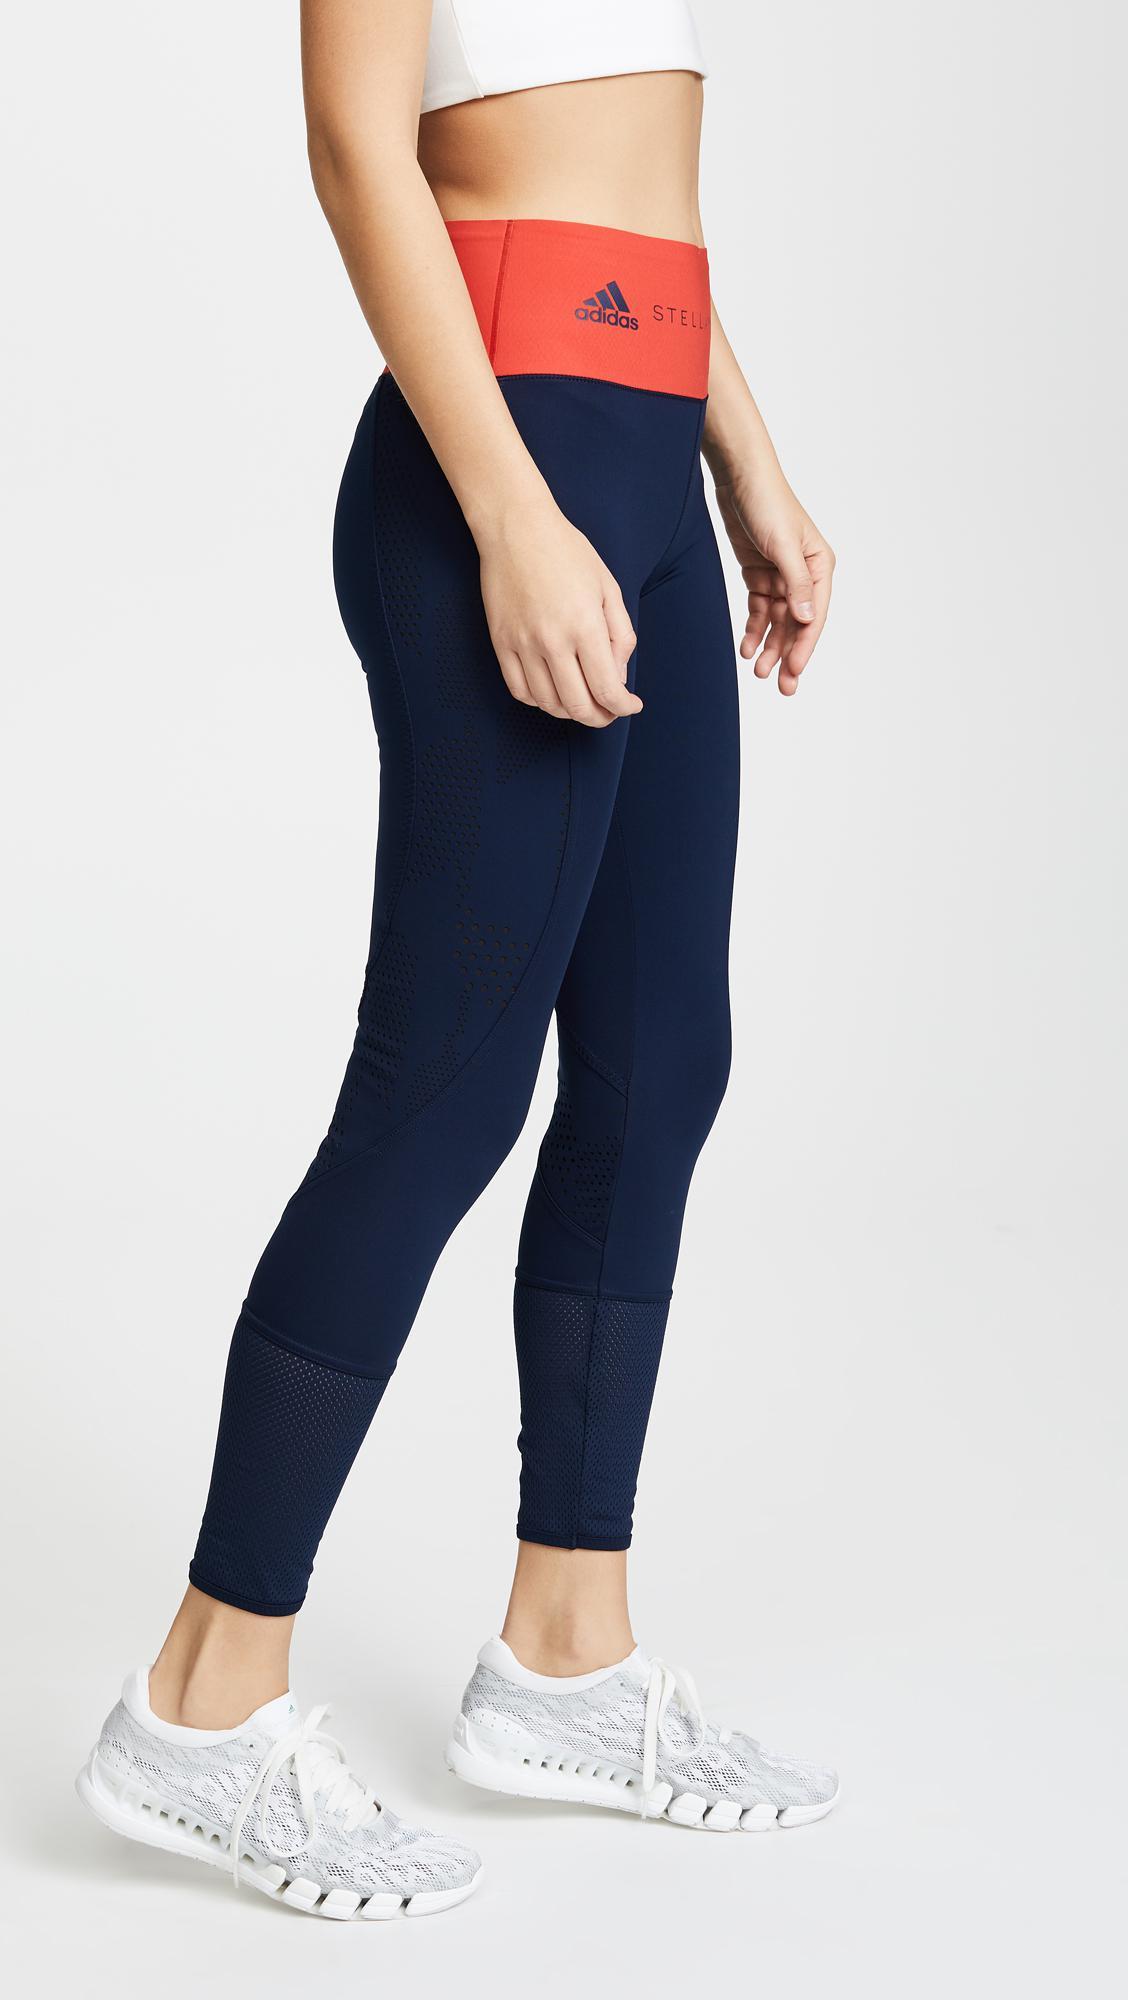 timeless design 0192b 189cd Lyst - adidas By Stella McCartney Train Ultimate Leggings in Blue